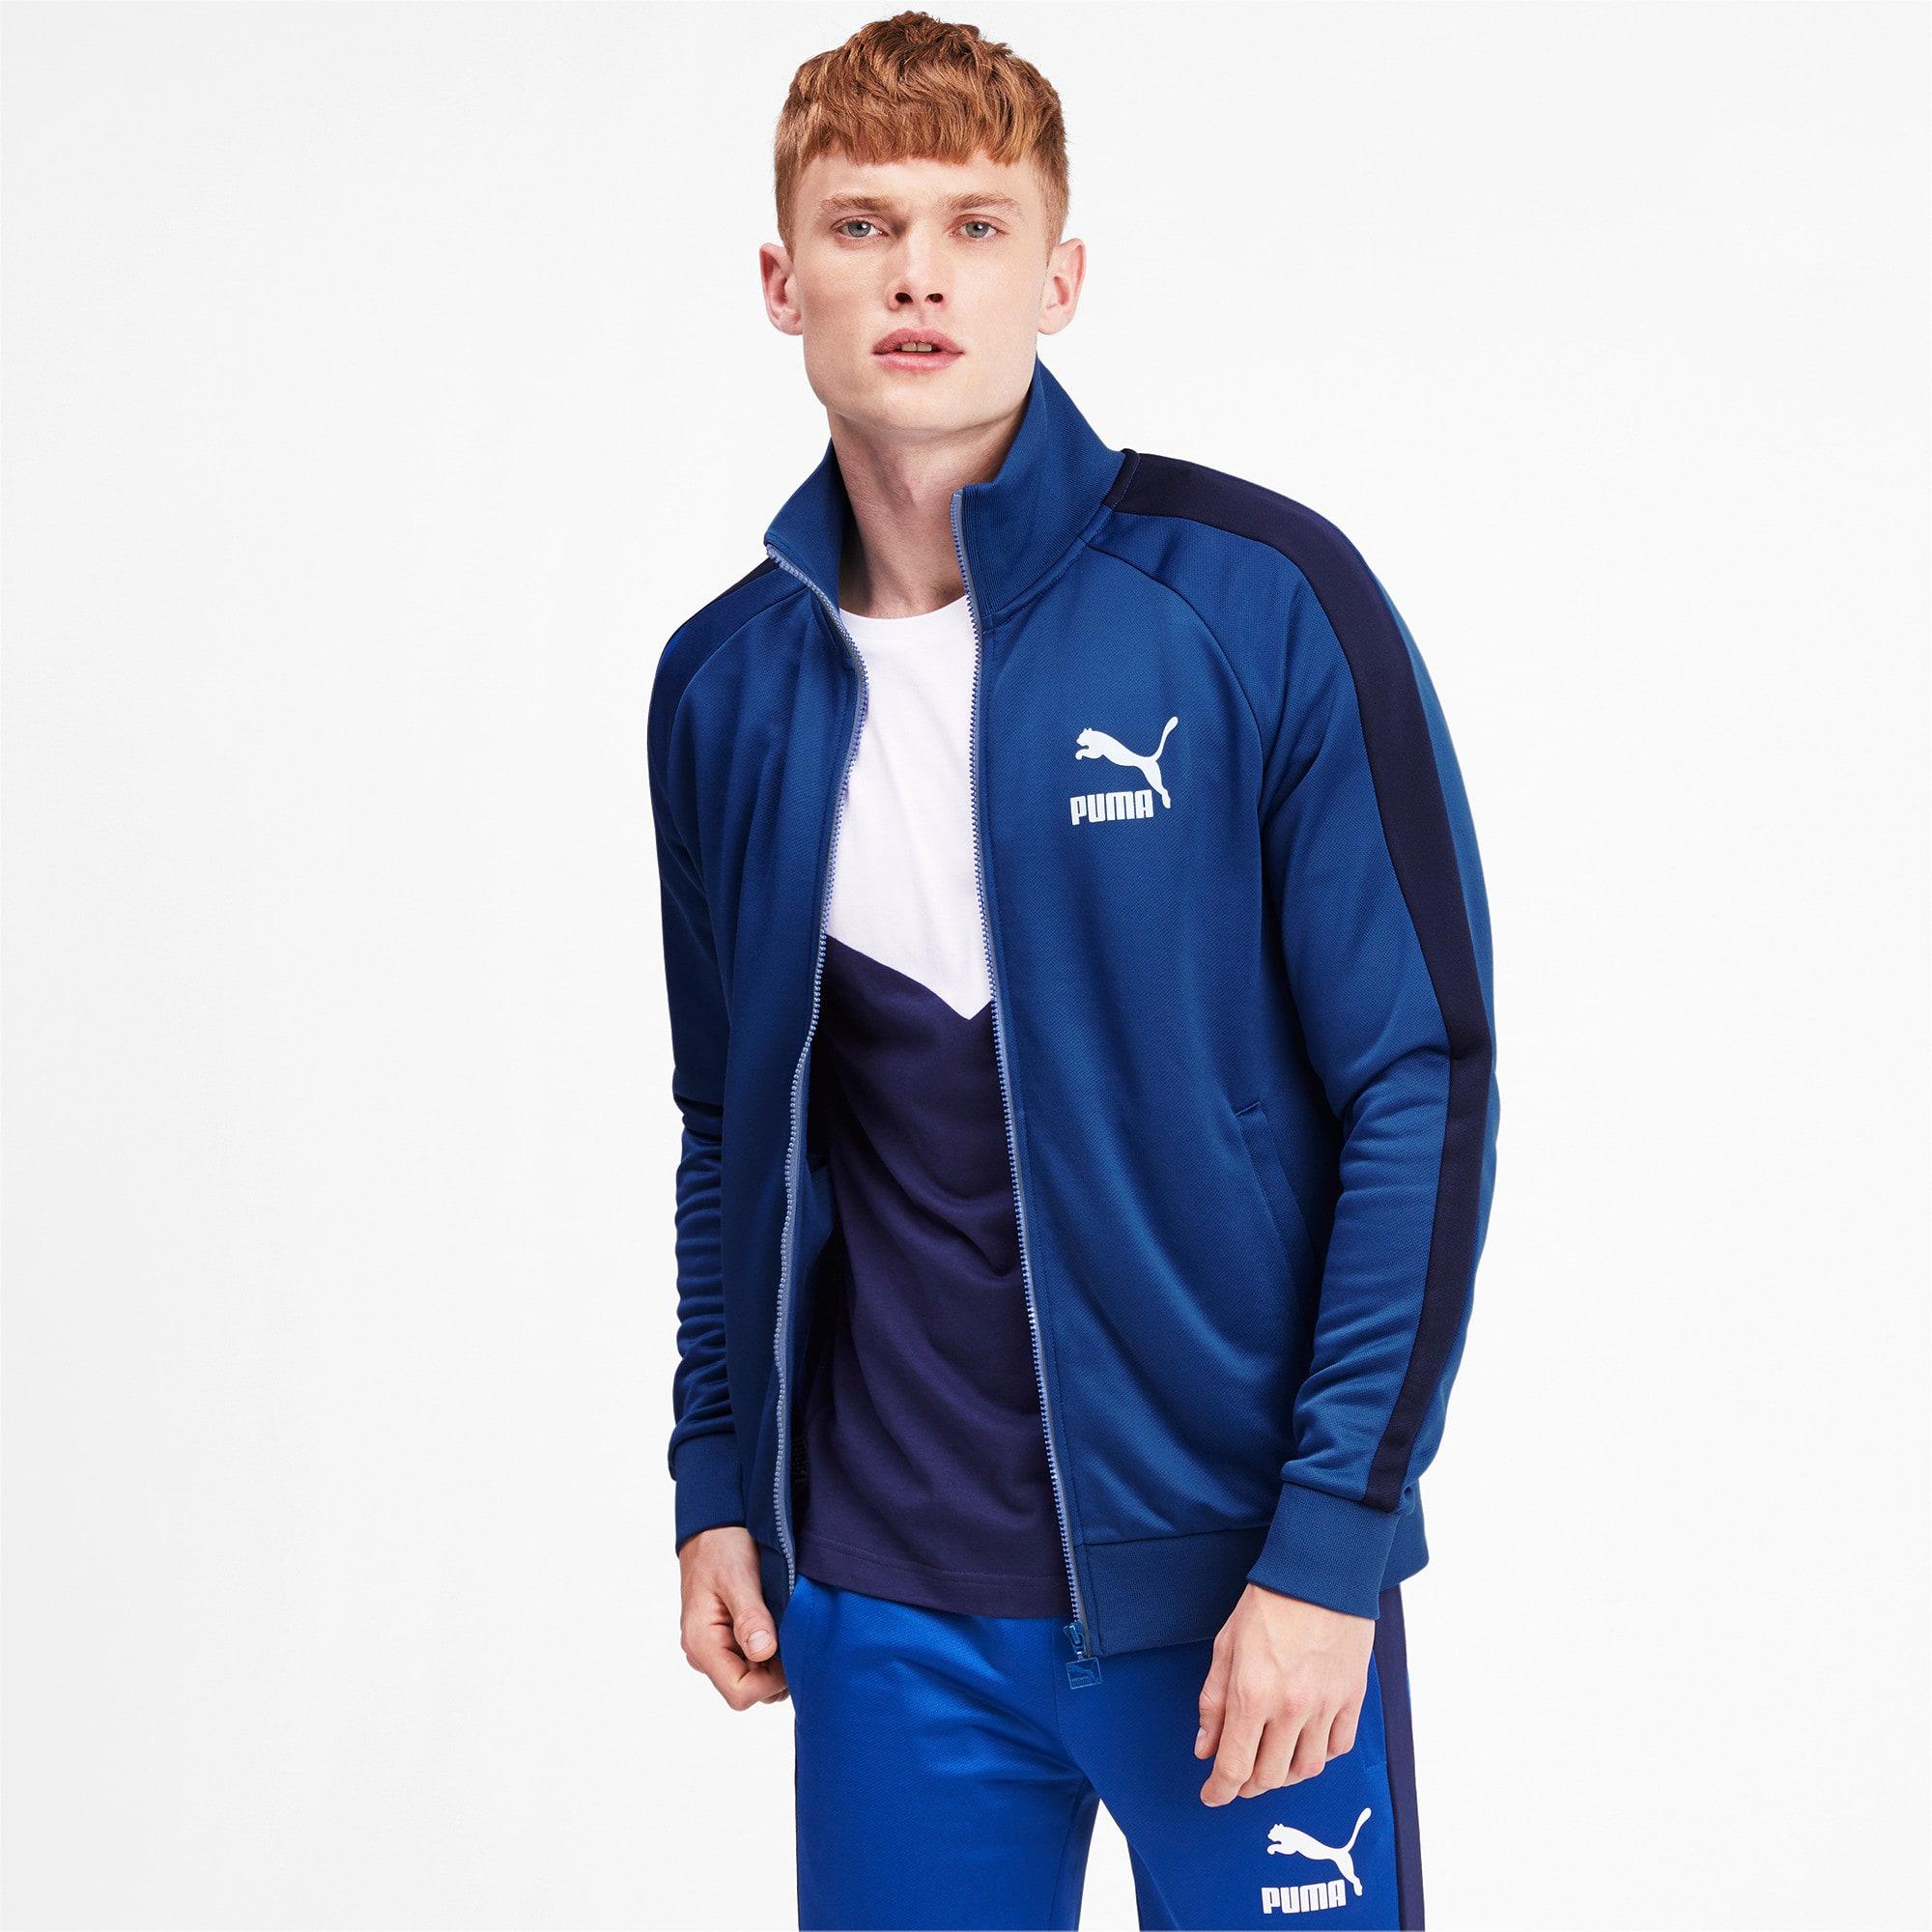 Thumbnail 2 of Iconic T7 Men's Track Jacket, Galaxy Blue, medium